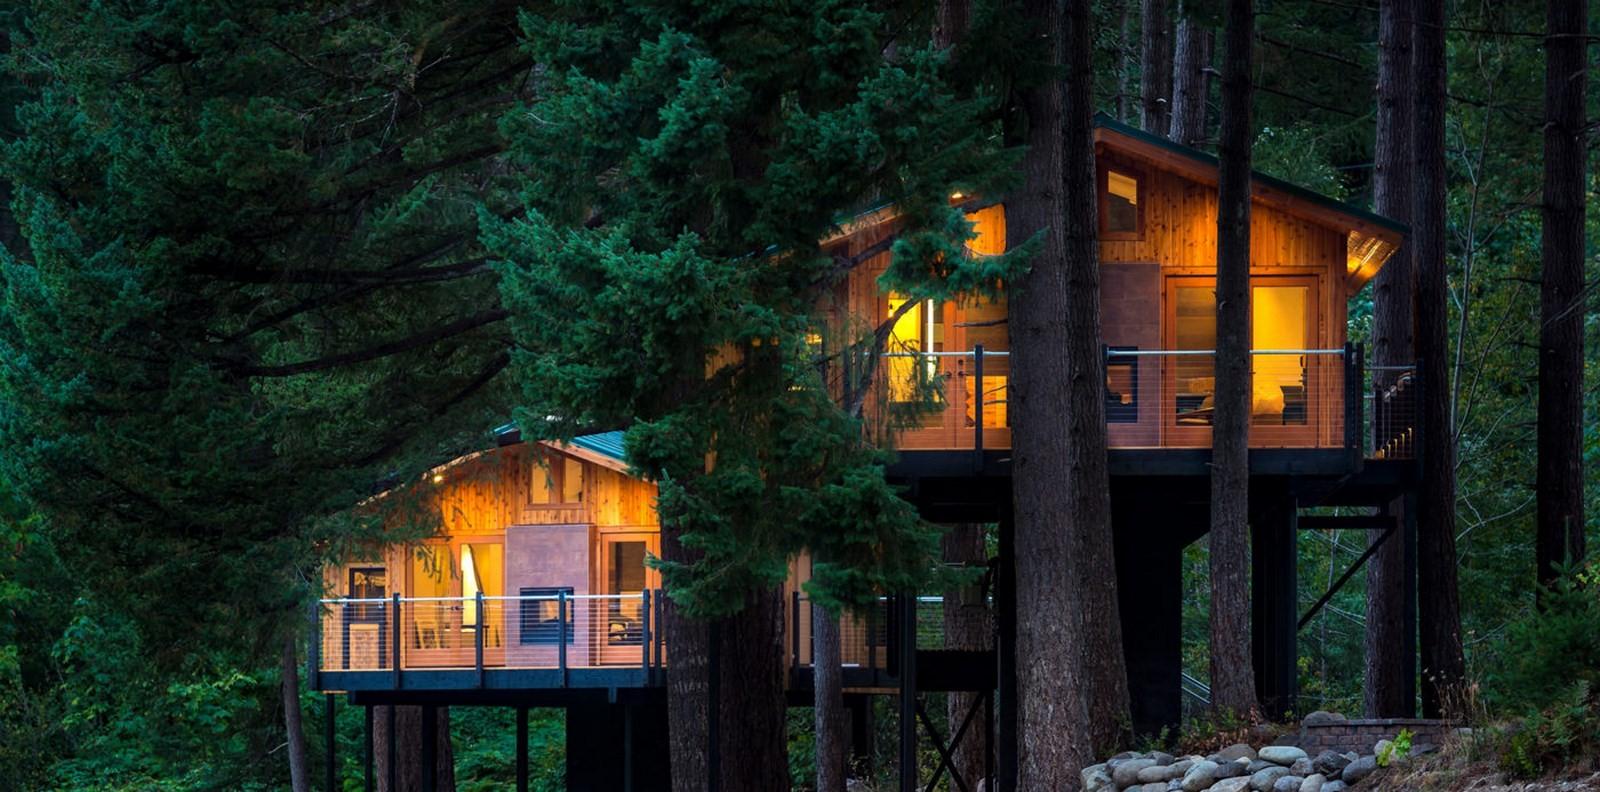 Tree Houses at Skamania Lodge (Stevenson, Washington) - Sheet